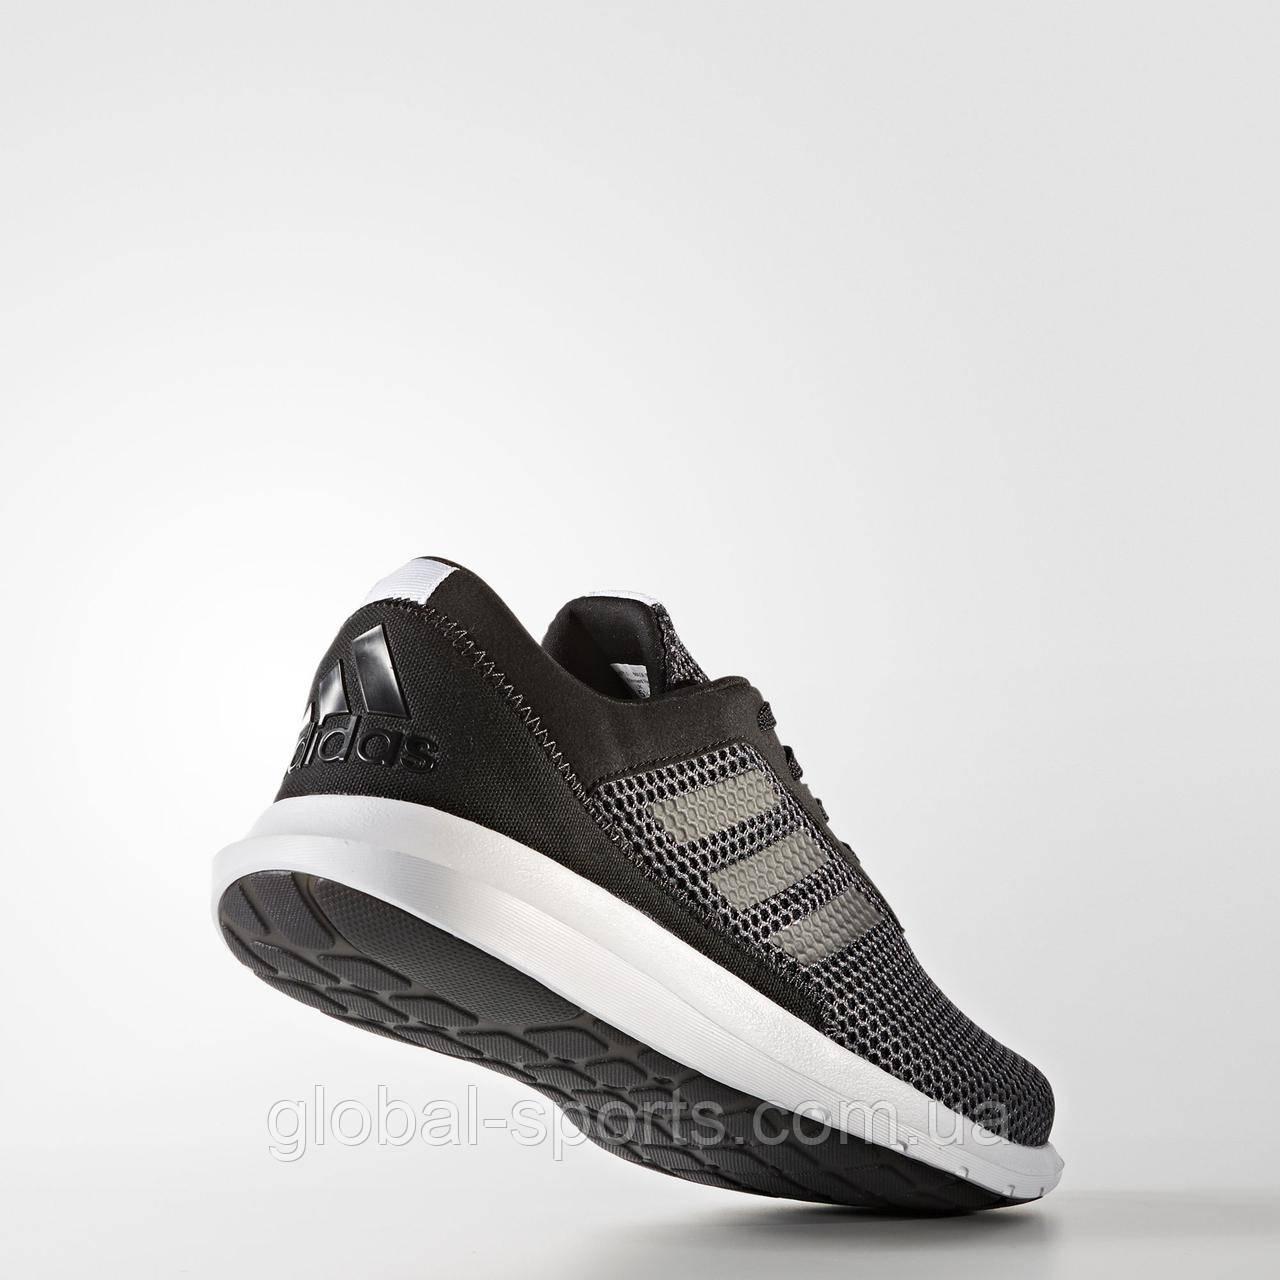 Женские кроссовки для бега Adidas Running(Артикул BY2886) d81e0c243f62c